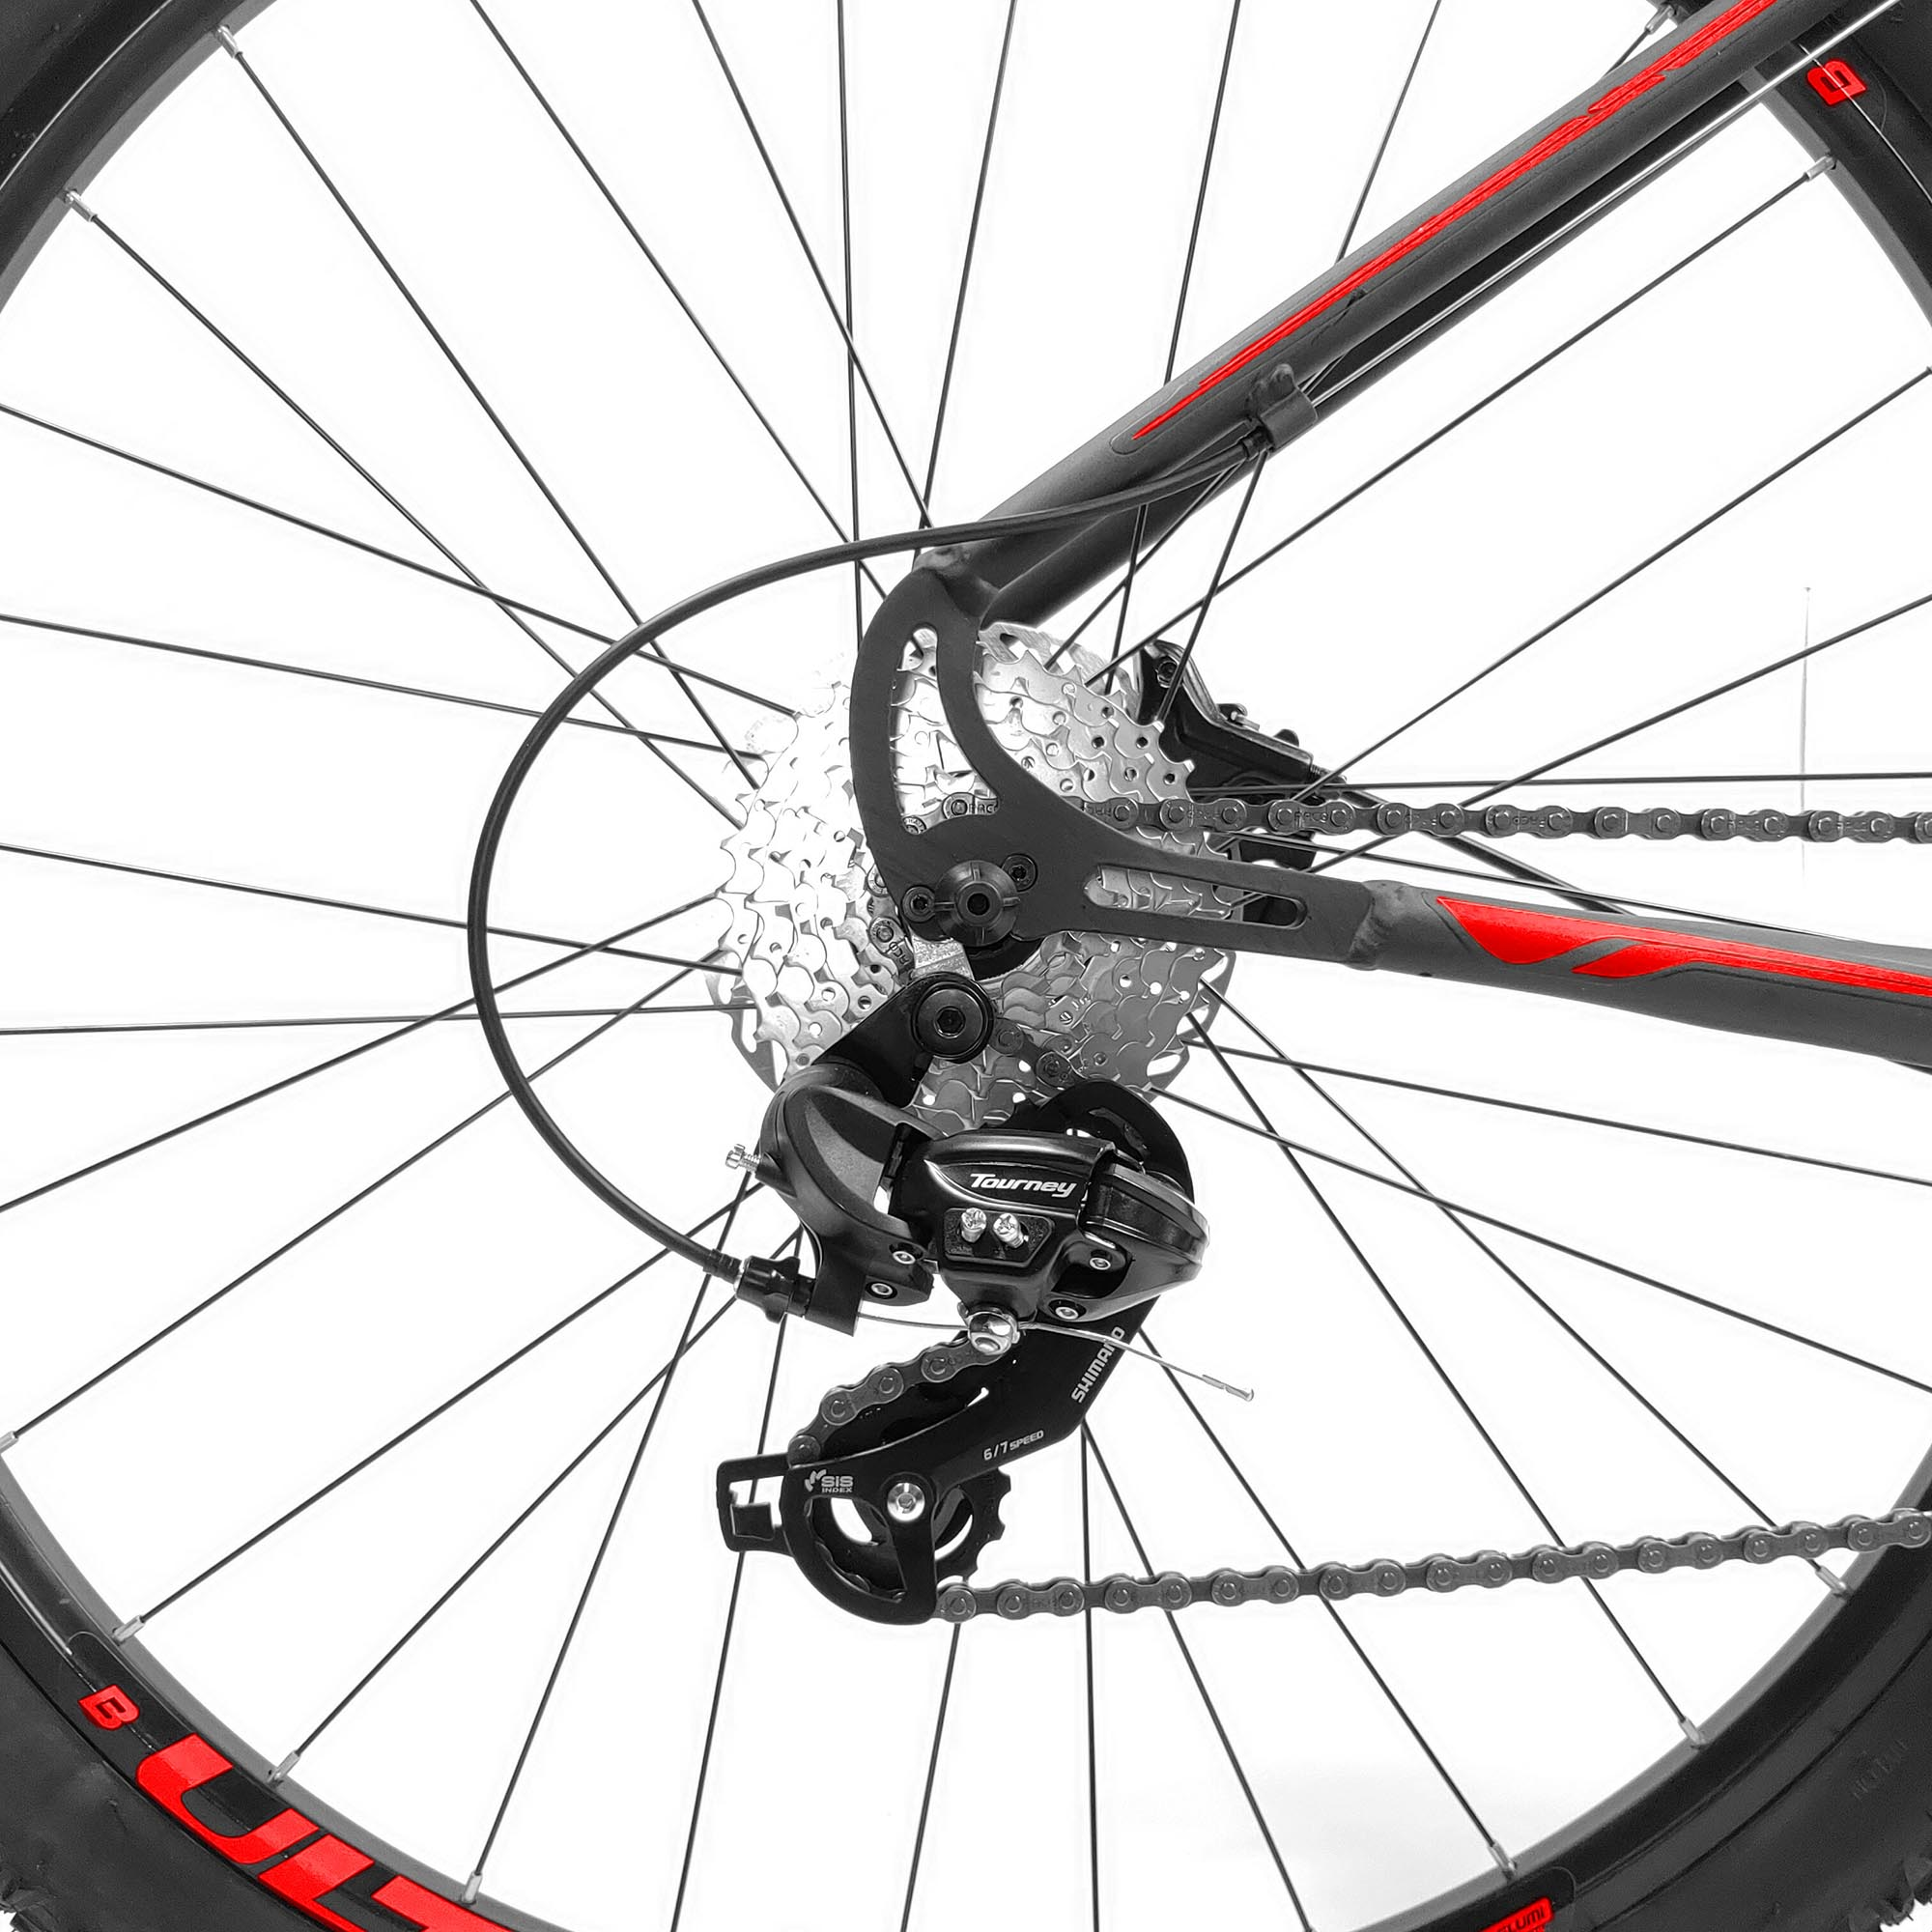 Bicicleta Aro 29 Heal Trial, Bicicleta Mtb, Bicicleta de Marcha